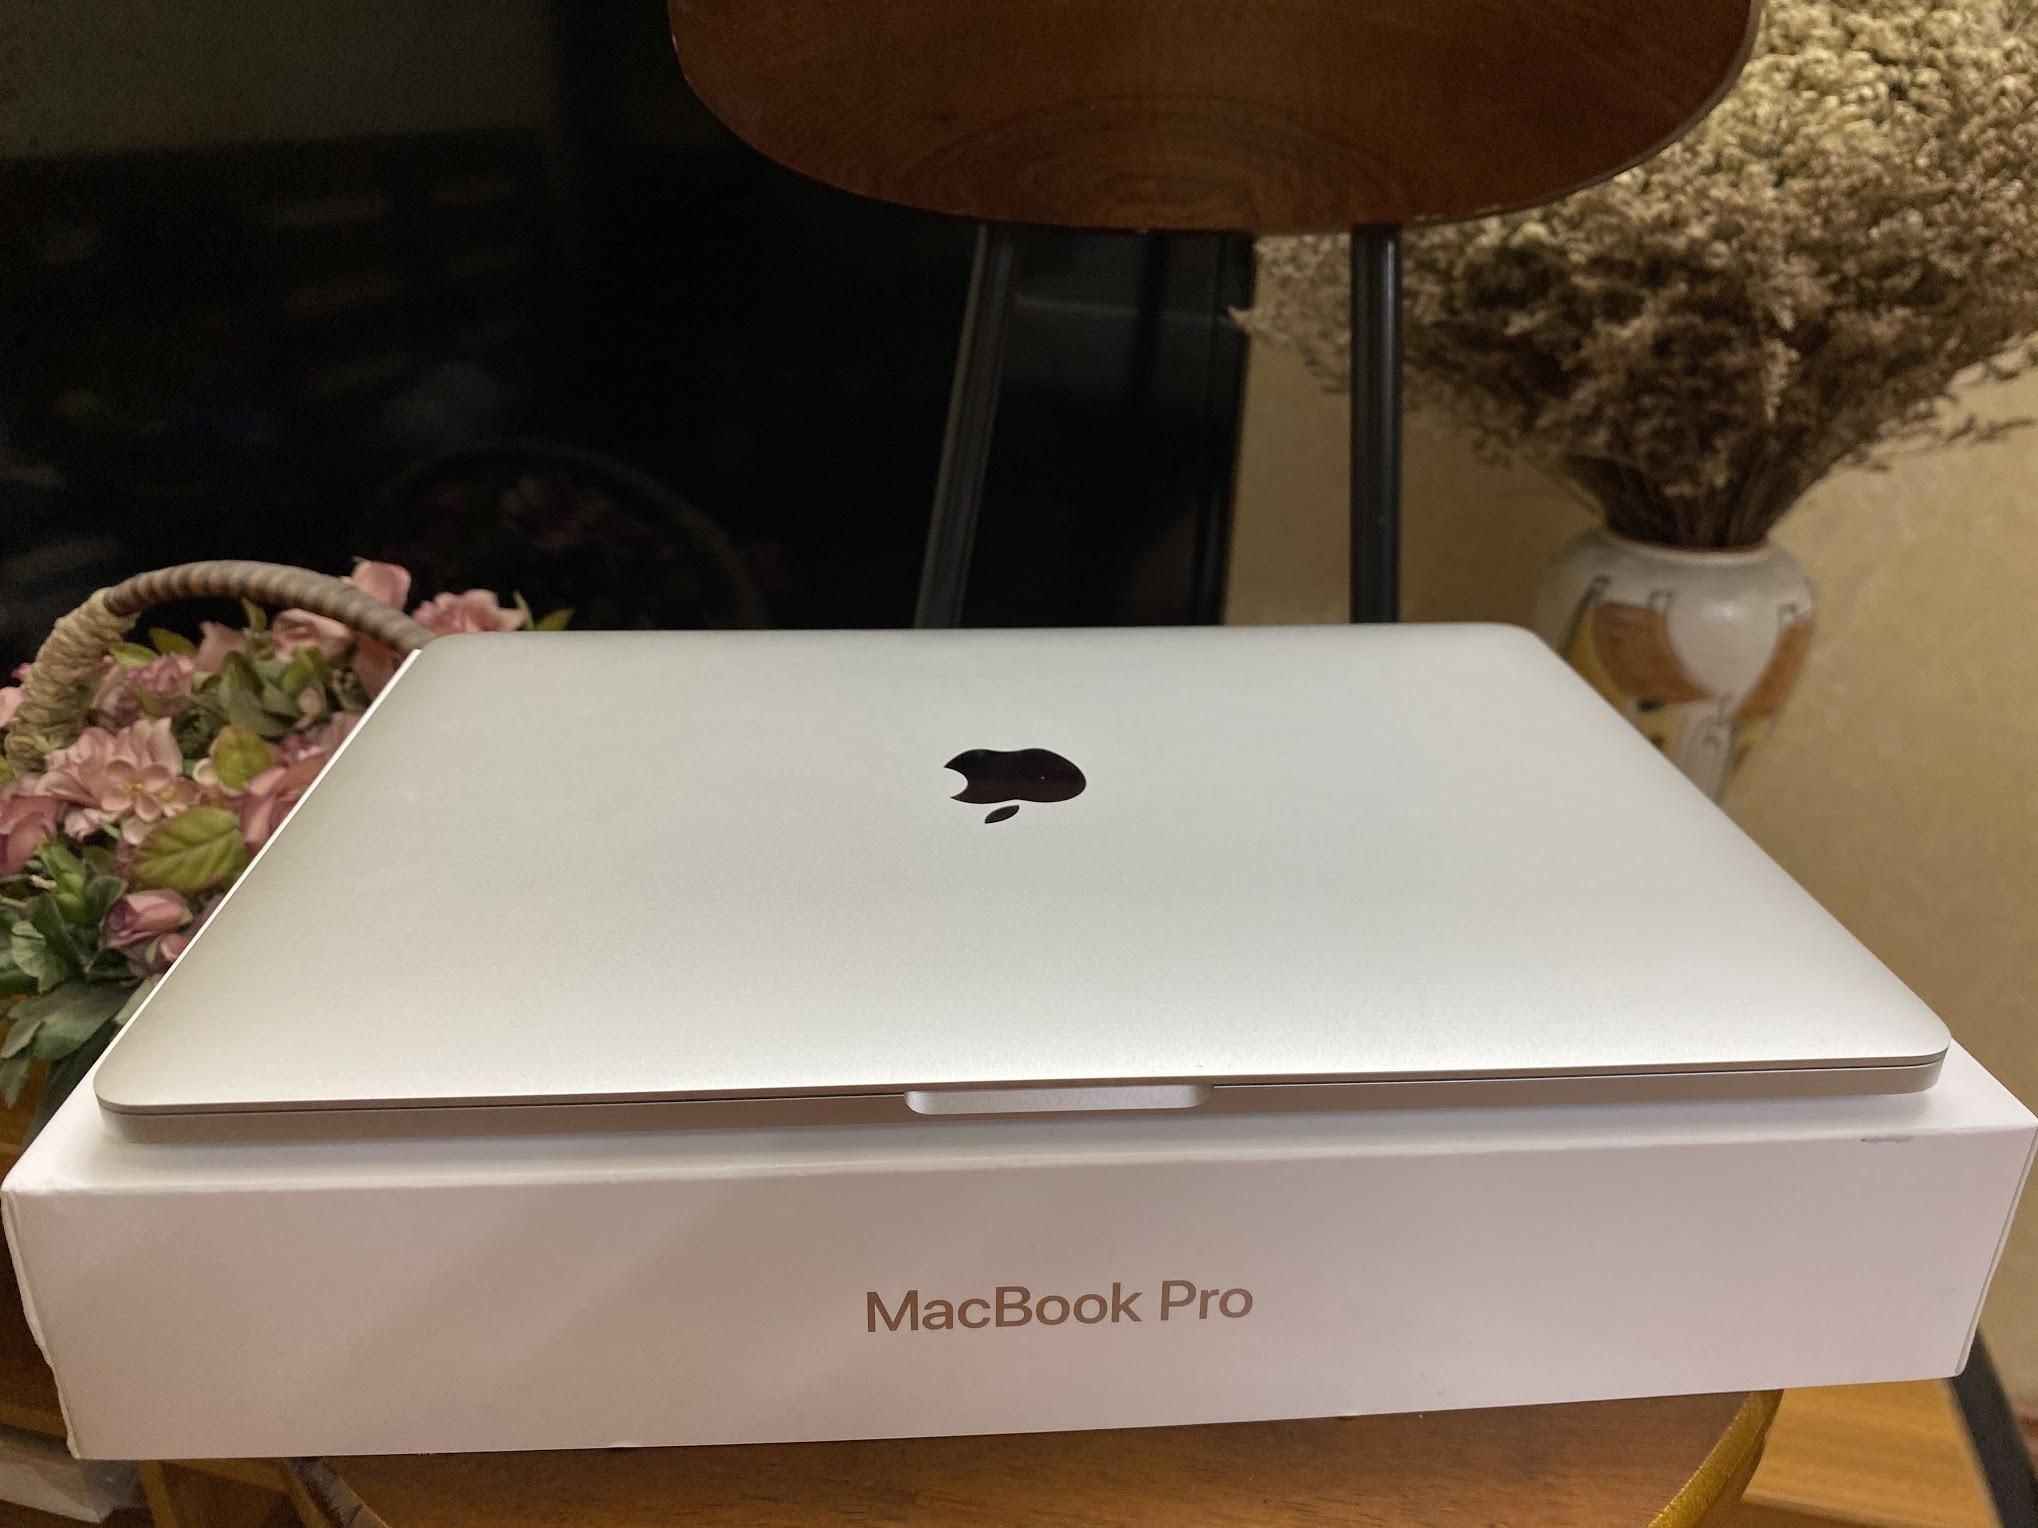 "Macbook Pro 2018 13"", Core i5/8GB/512GB"